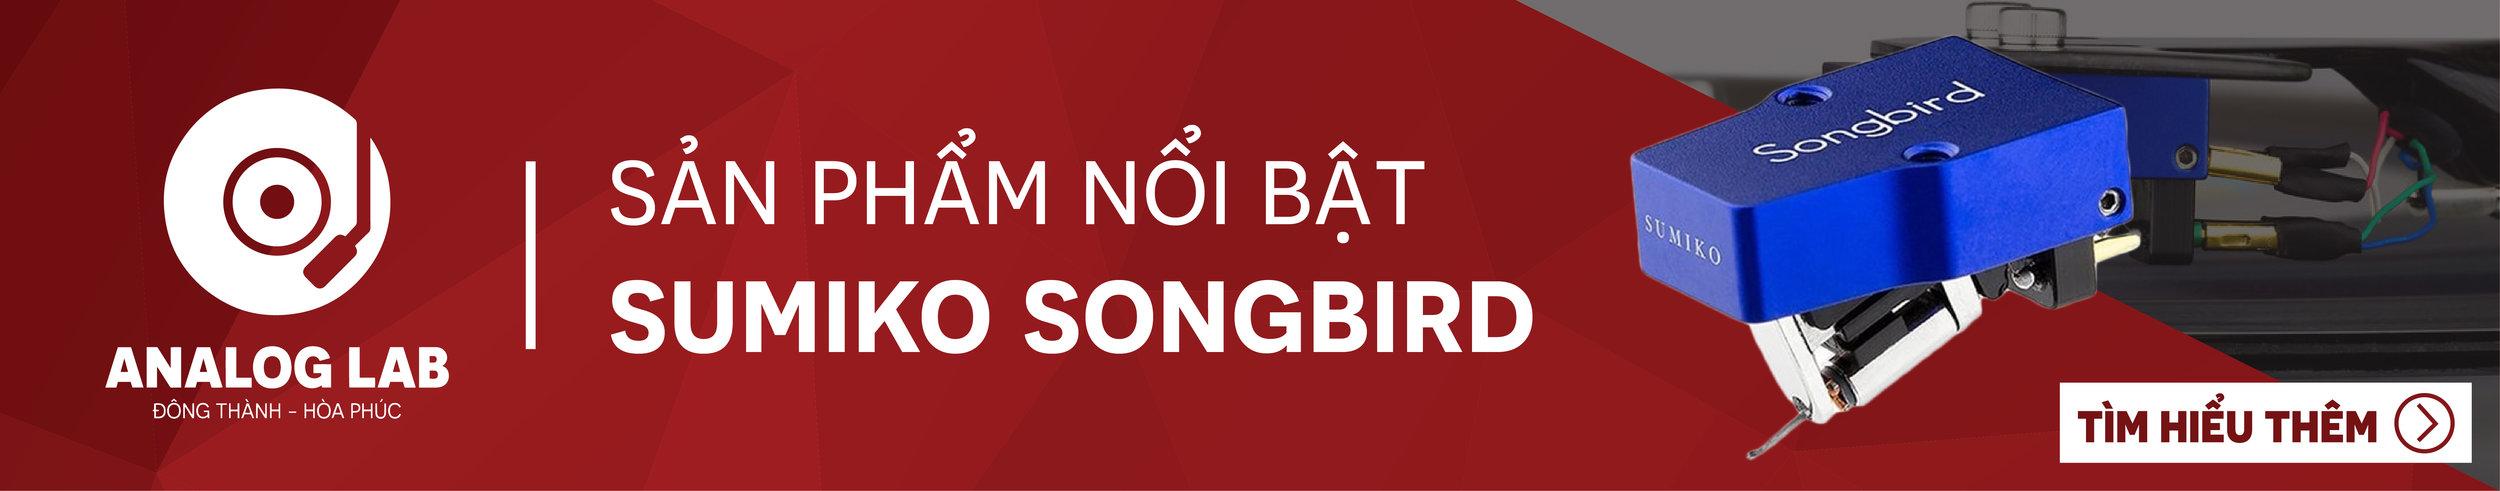 Sumiko Songbird Analog Lab